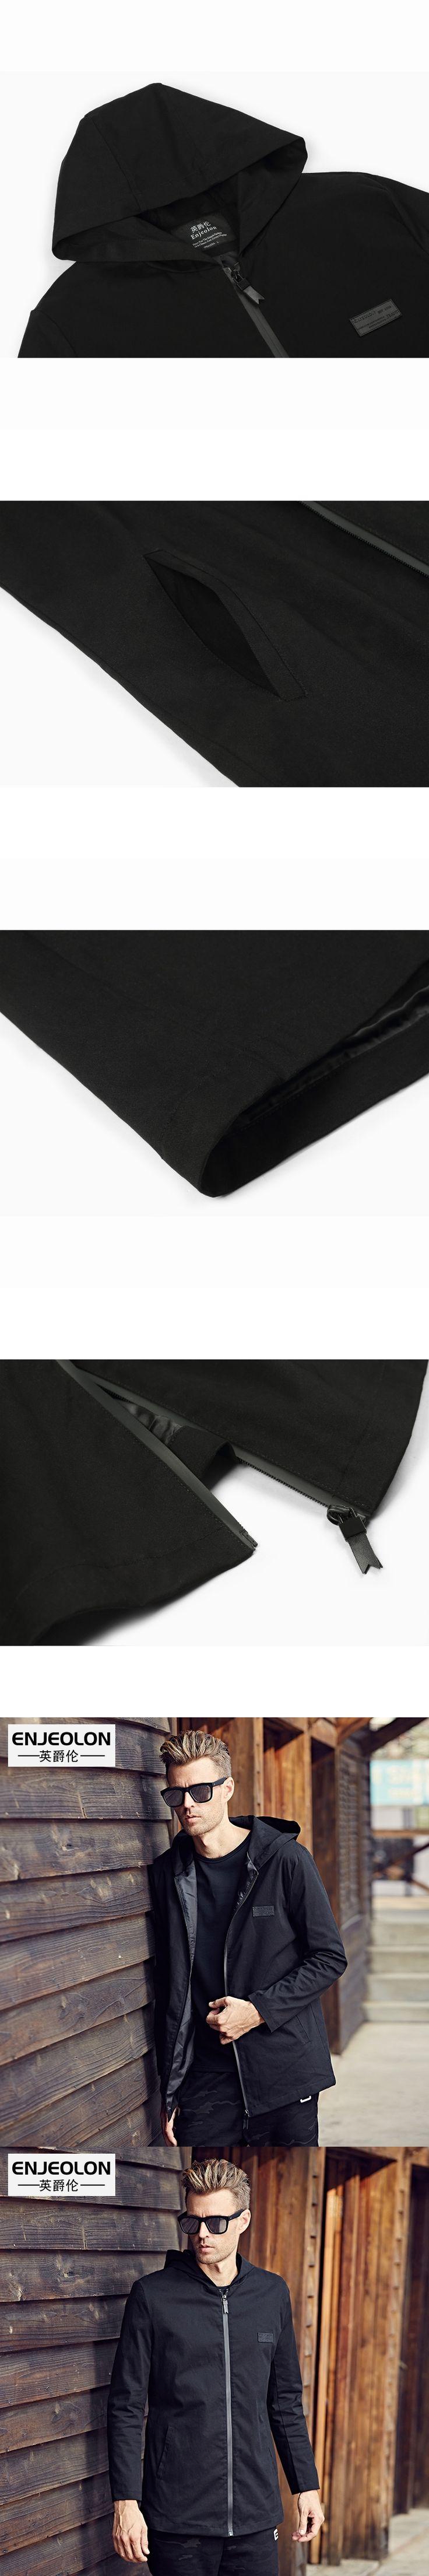 Enjeolon brand 2017 hoodies Bomber windbreaker jackets men, black solid Men casual coat,hooded Jacket Men clothes WT0516